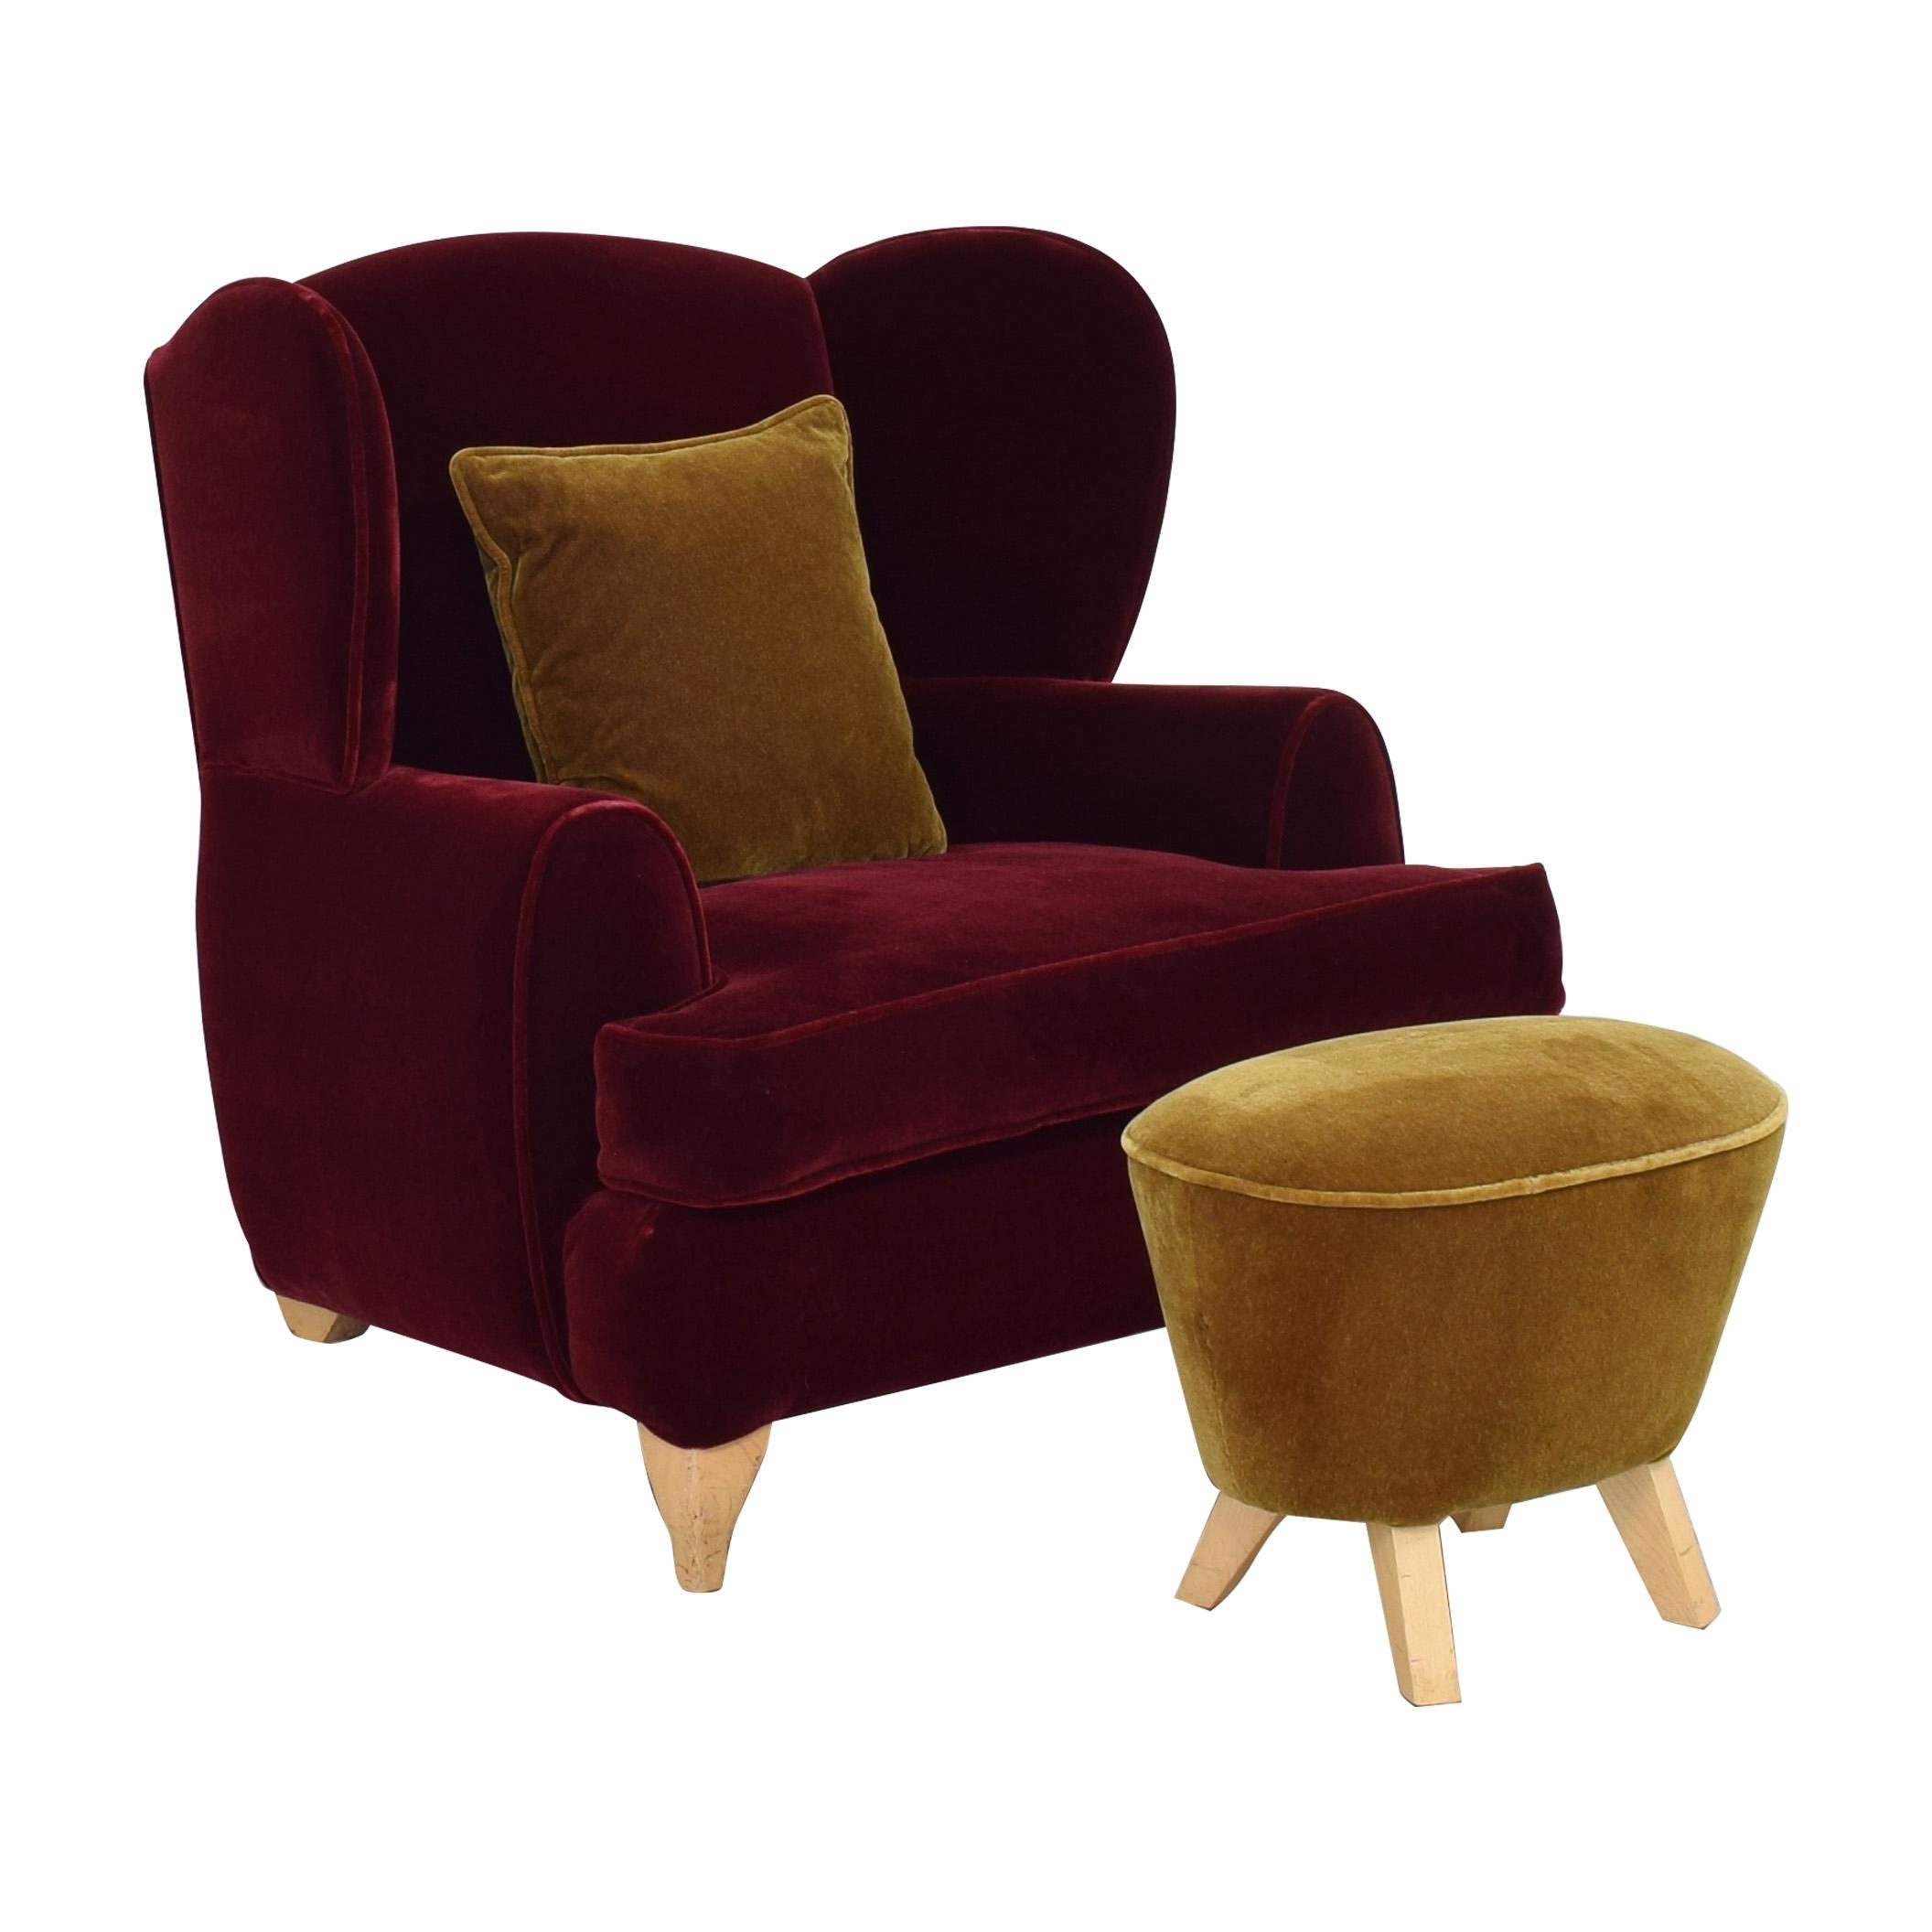 Custom Wingback Chair and Ottoman price